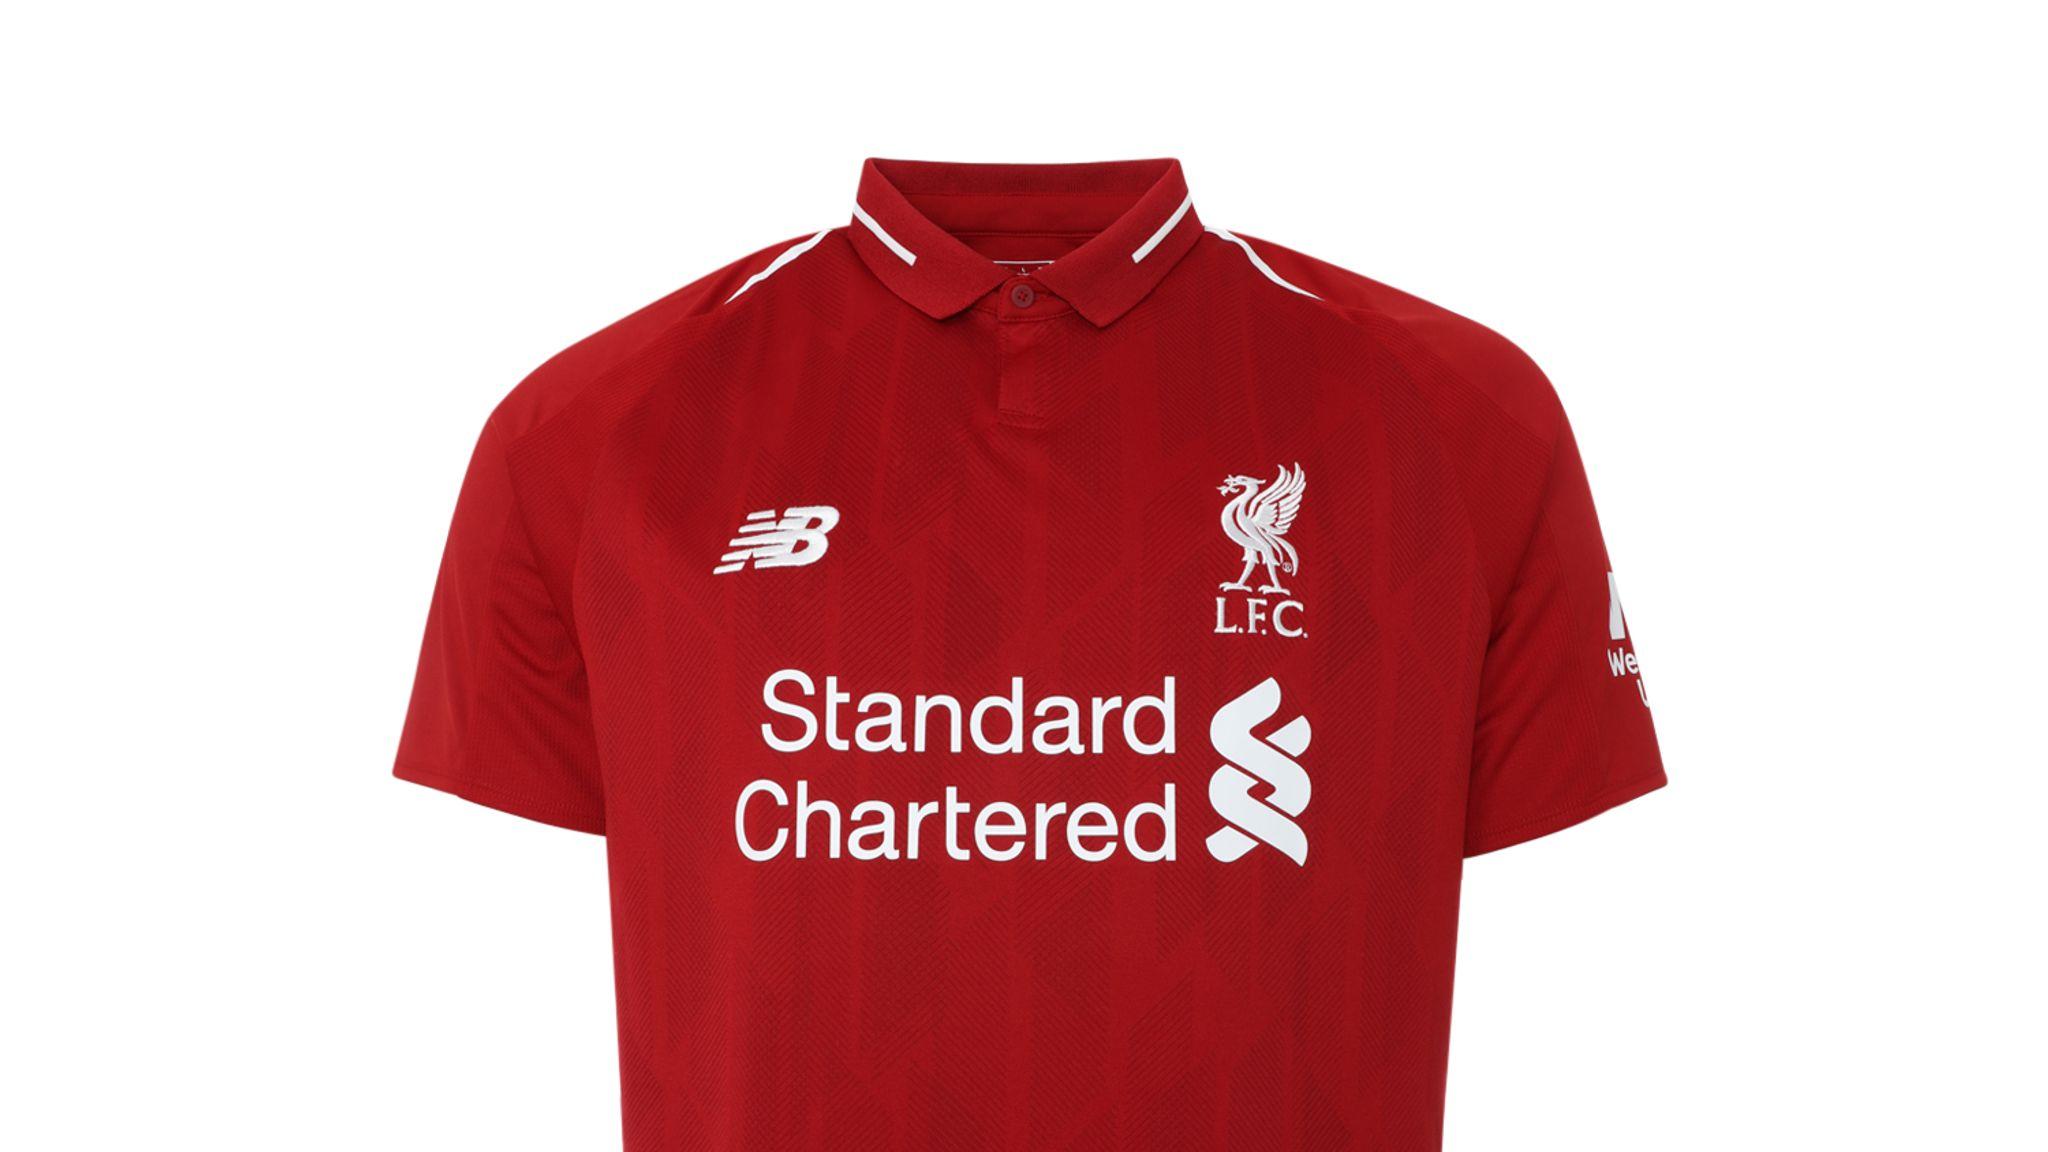 64a86431be New football kits: Premier League strips for the 2018/19 season | Football  News | Sky Sports